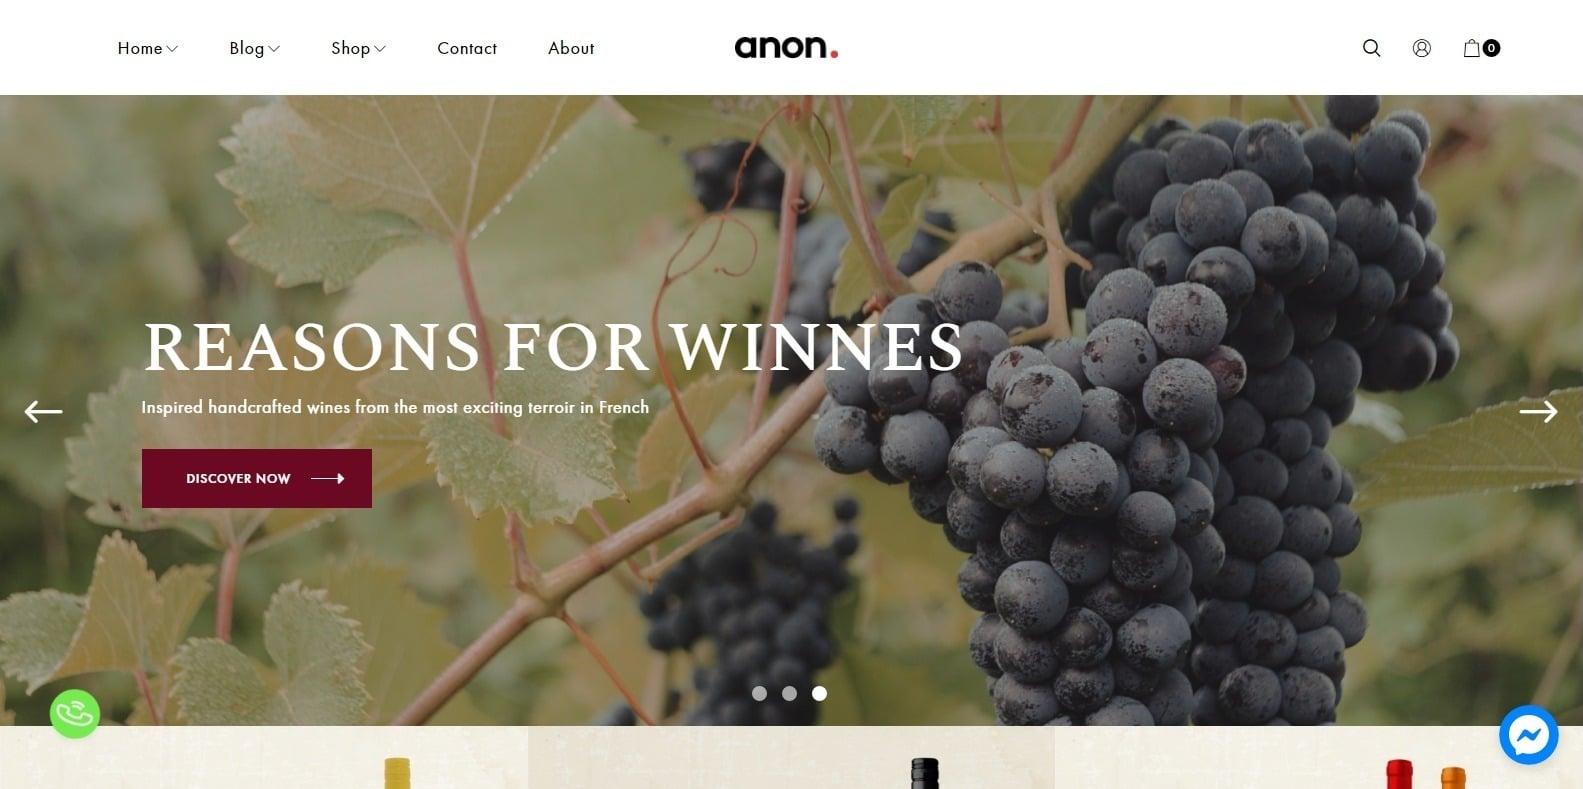 anon-multipurpose-website-template